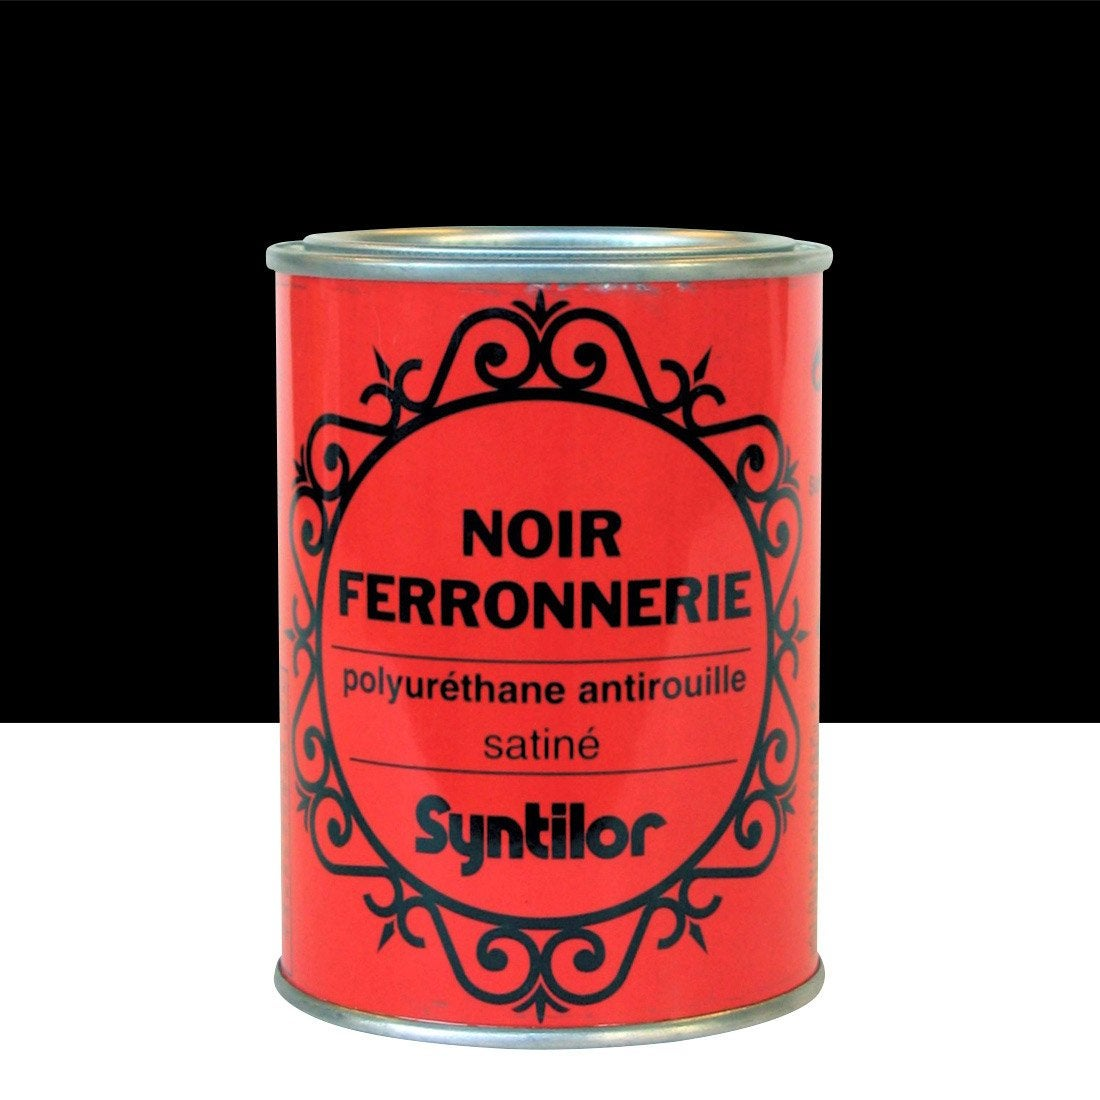 Peinture ferronnerie ext rieur syntilor noir l leroy merlin - Peinture polyurethane leroy merlin ...